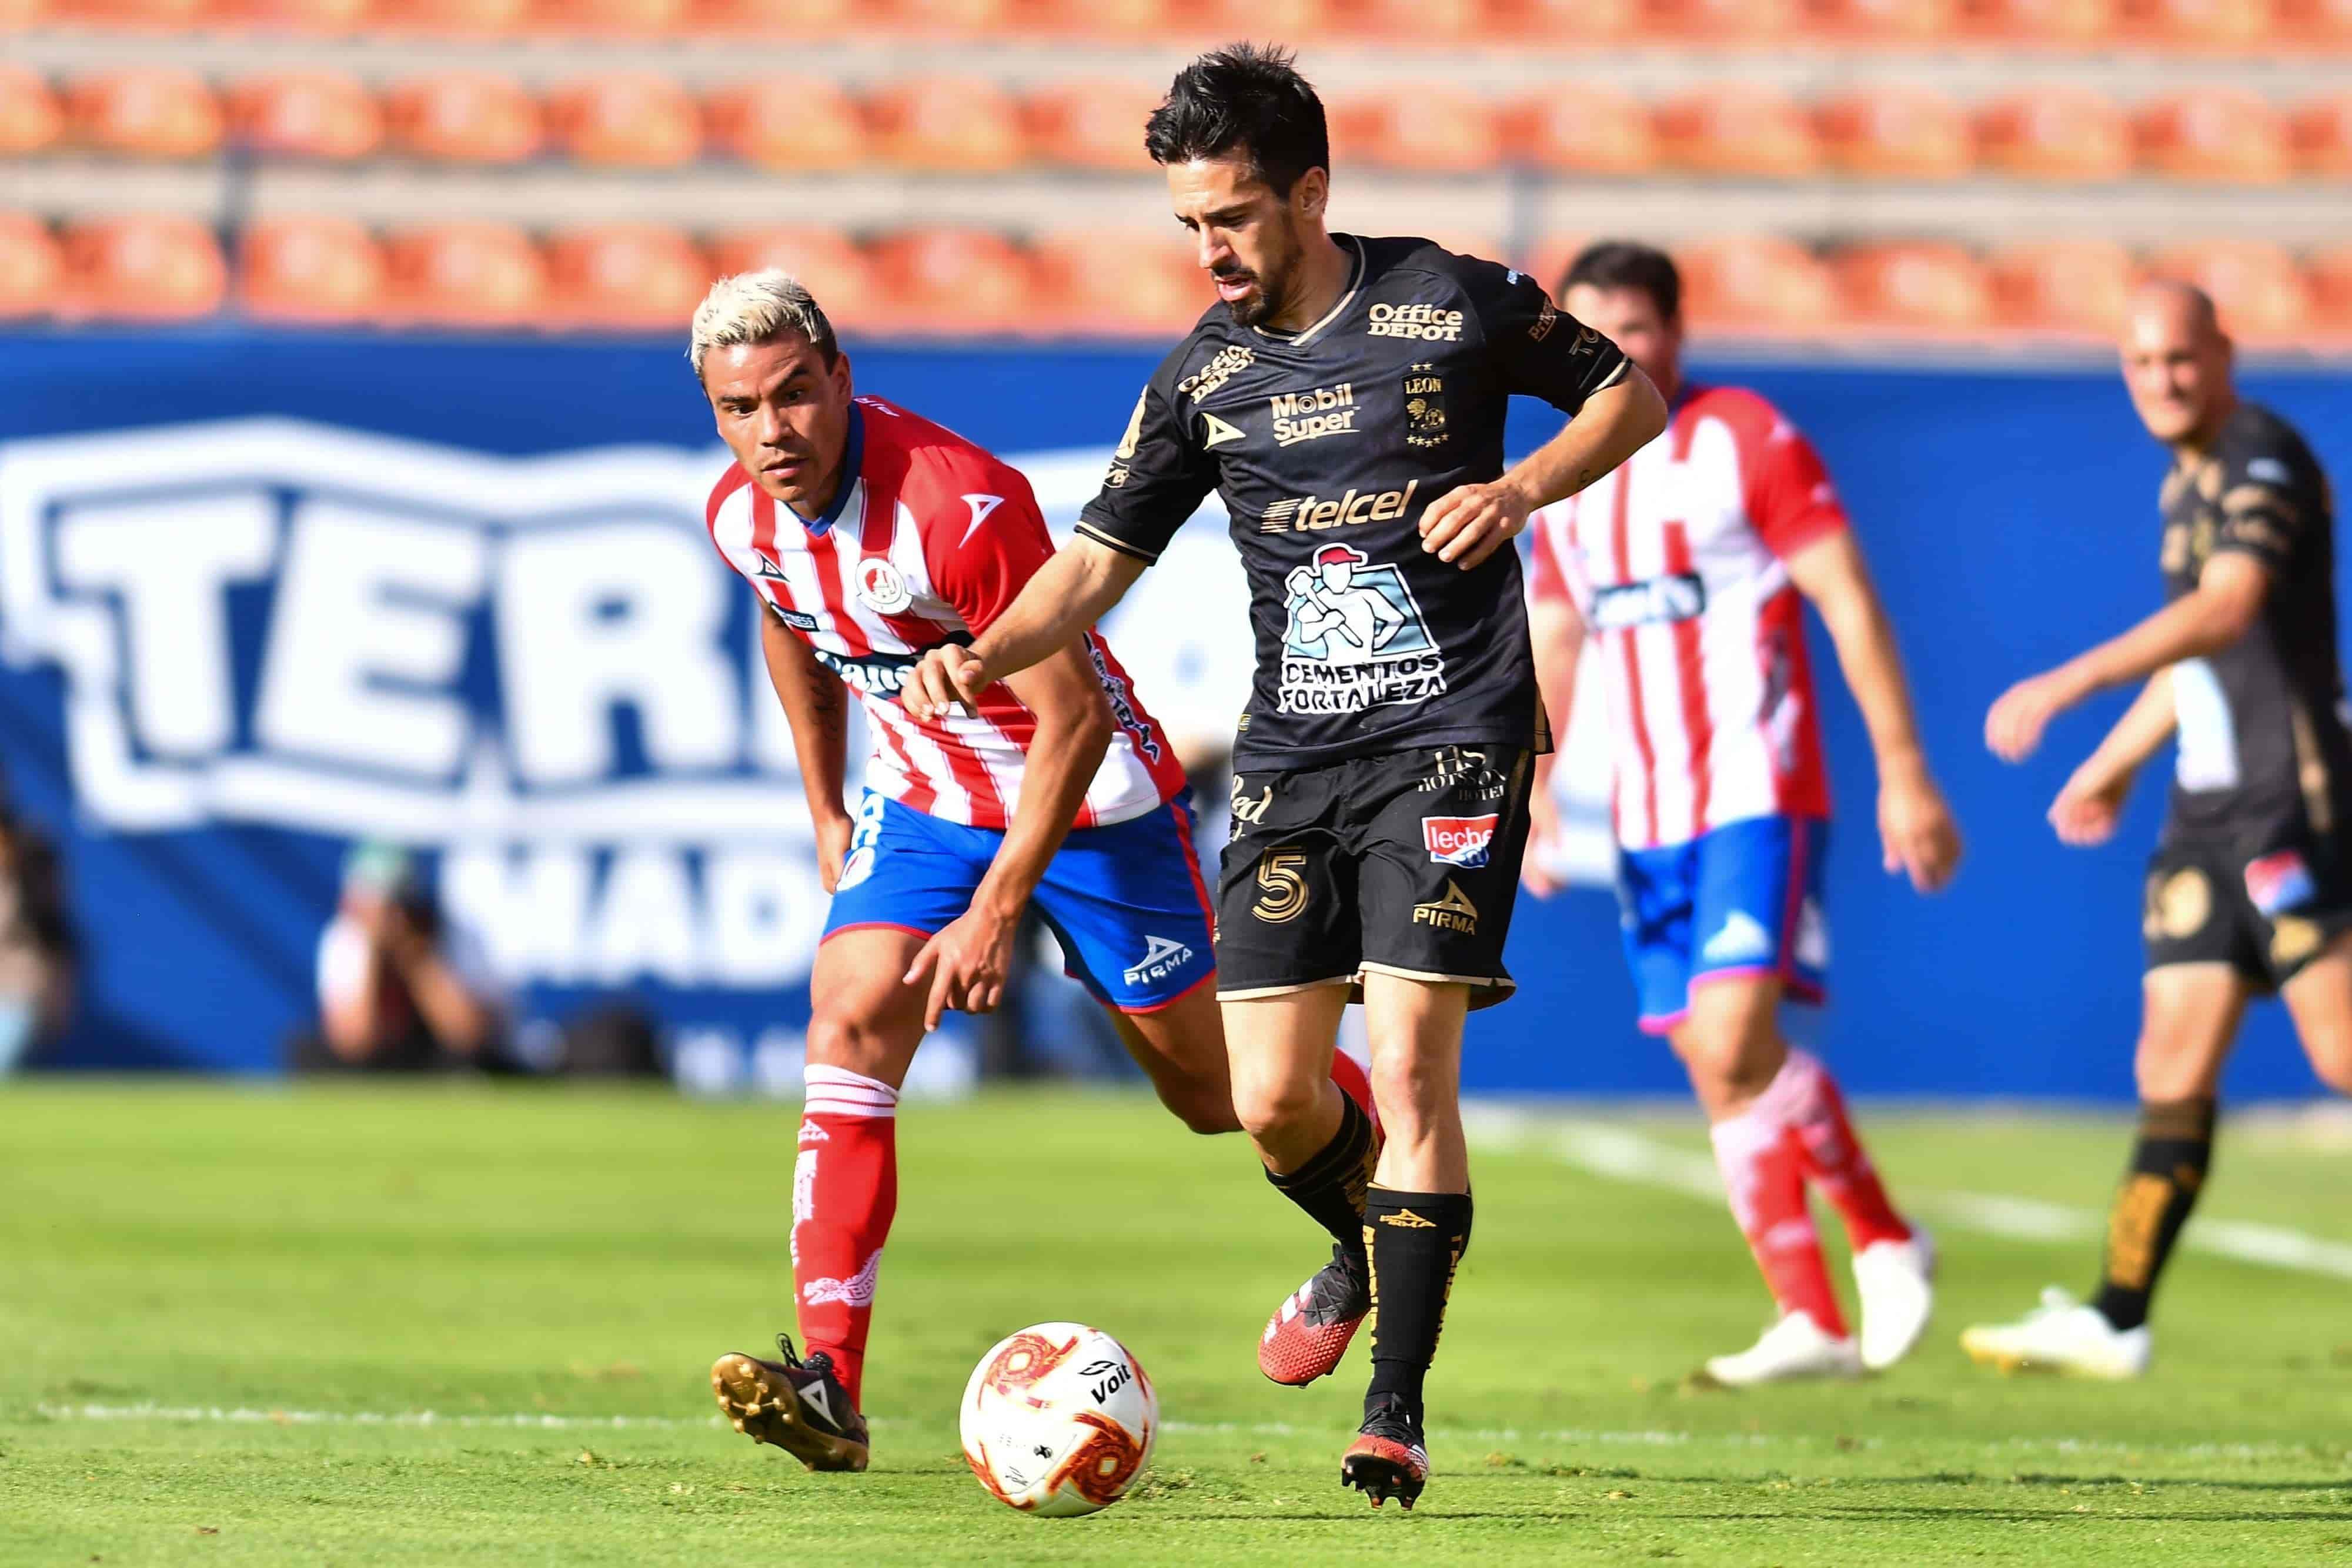 Atlético de San Luis 0-2 León